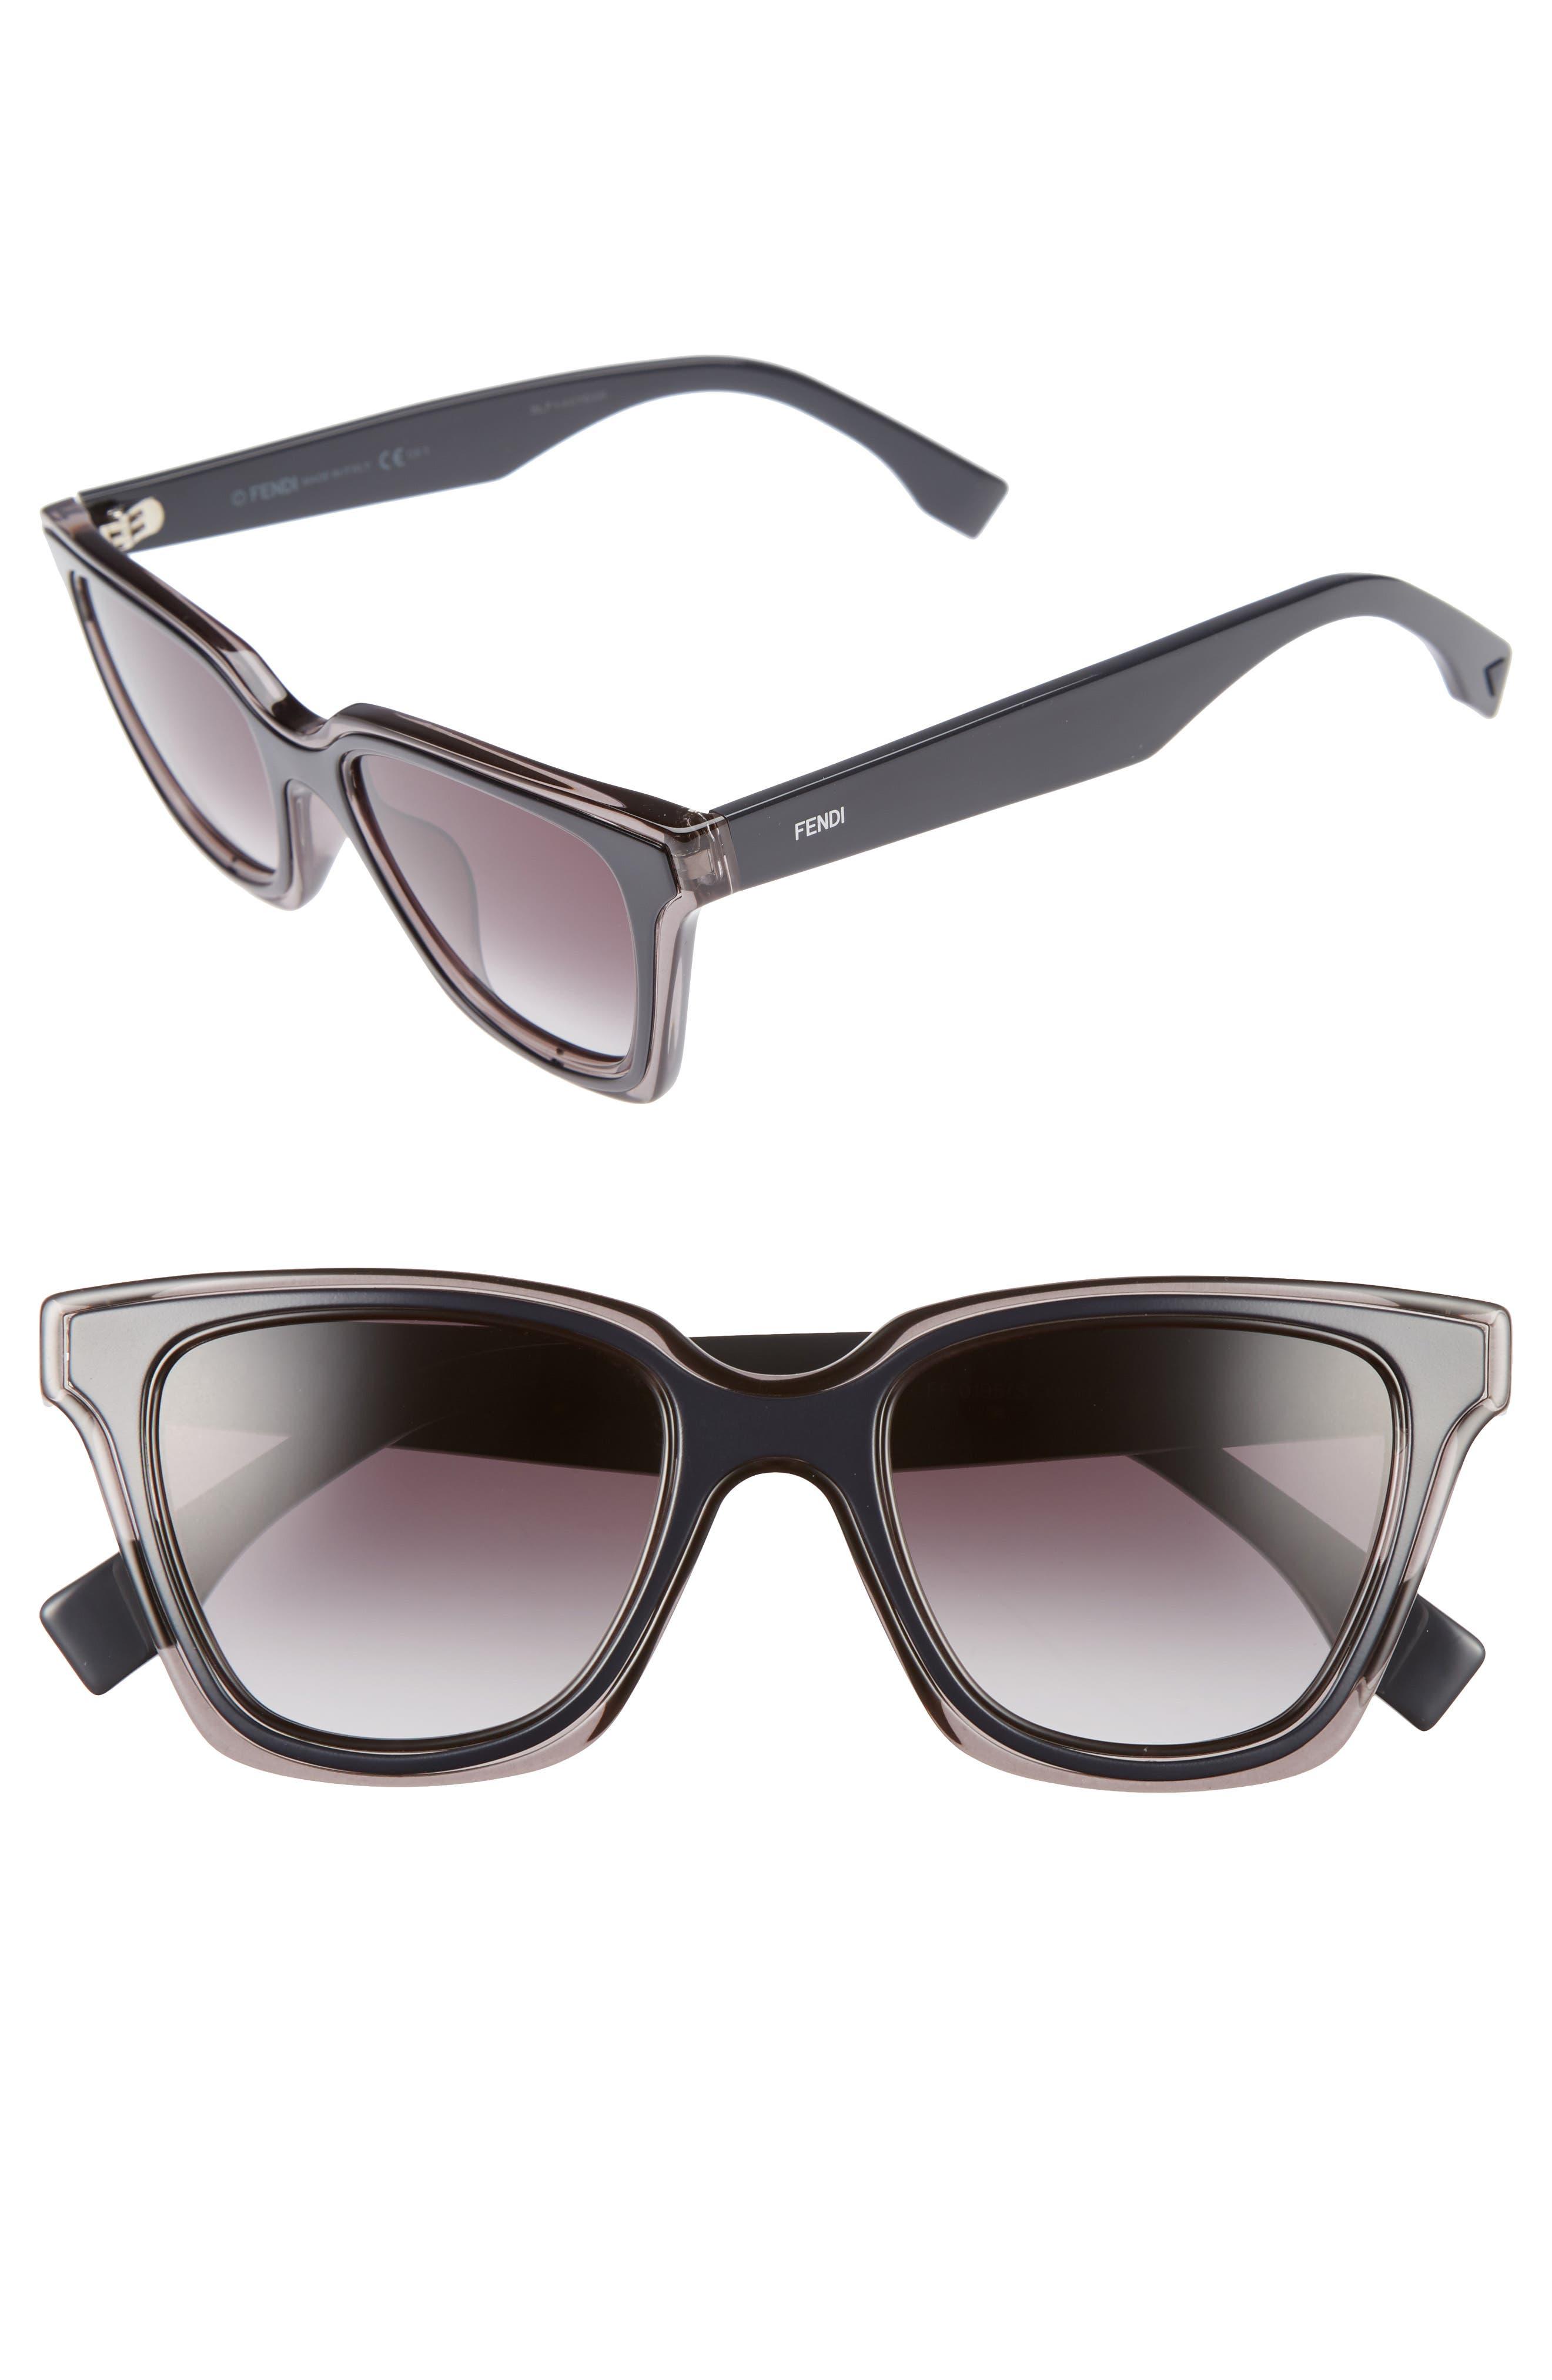 Be You 50mm Gradient Sunglasses,                             Alternate thumbnail 2, color,                             020